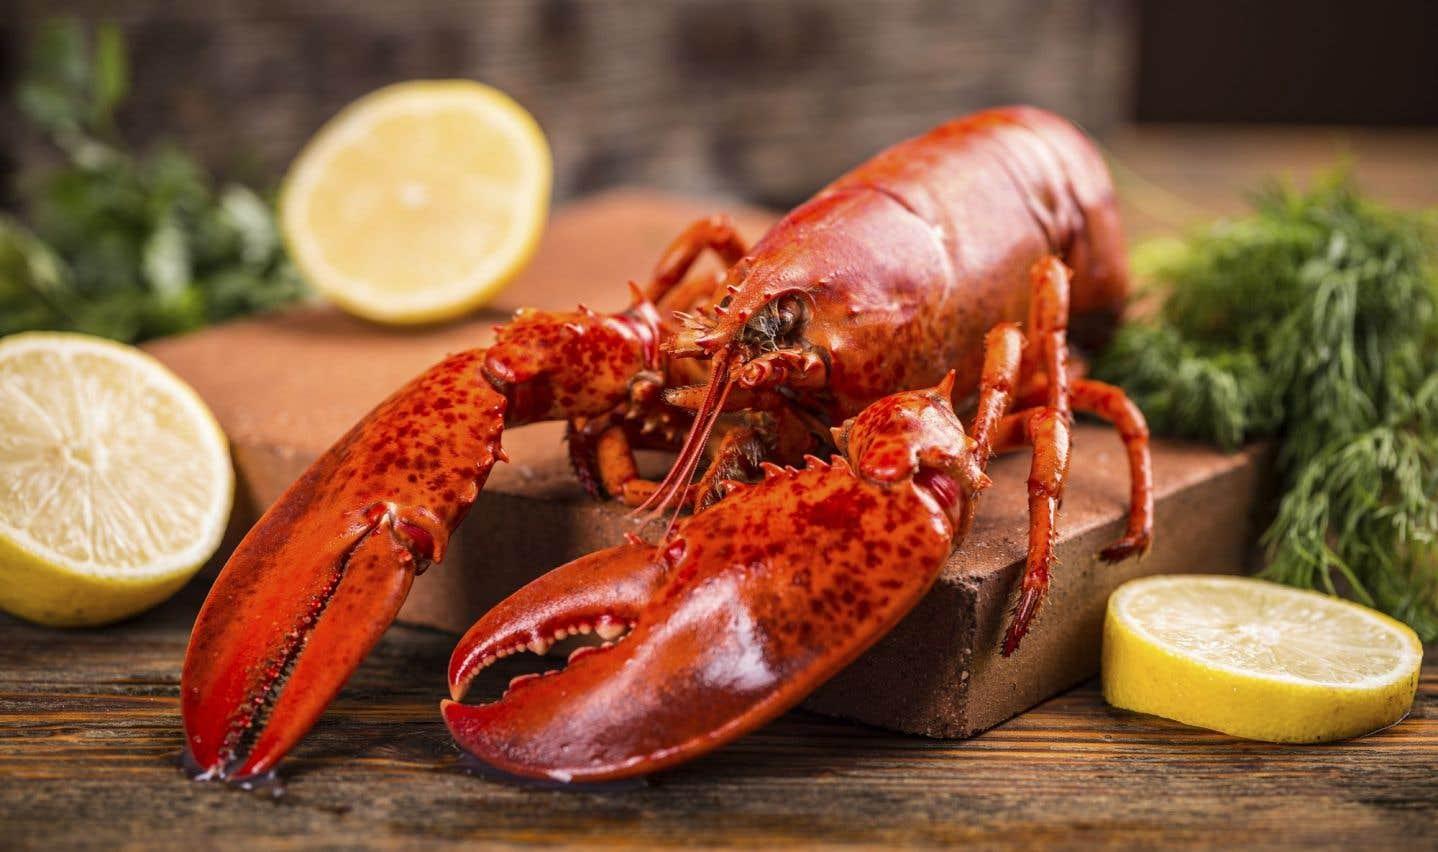 Le homard du Québec